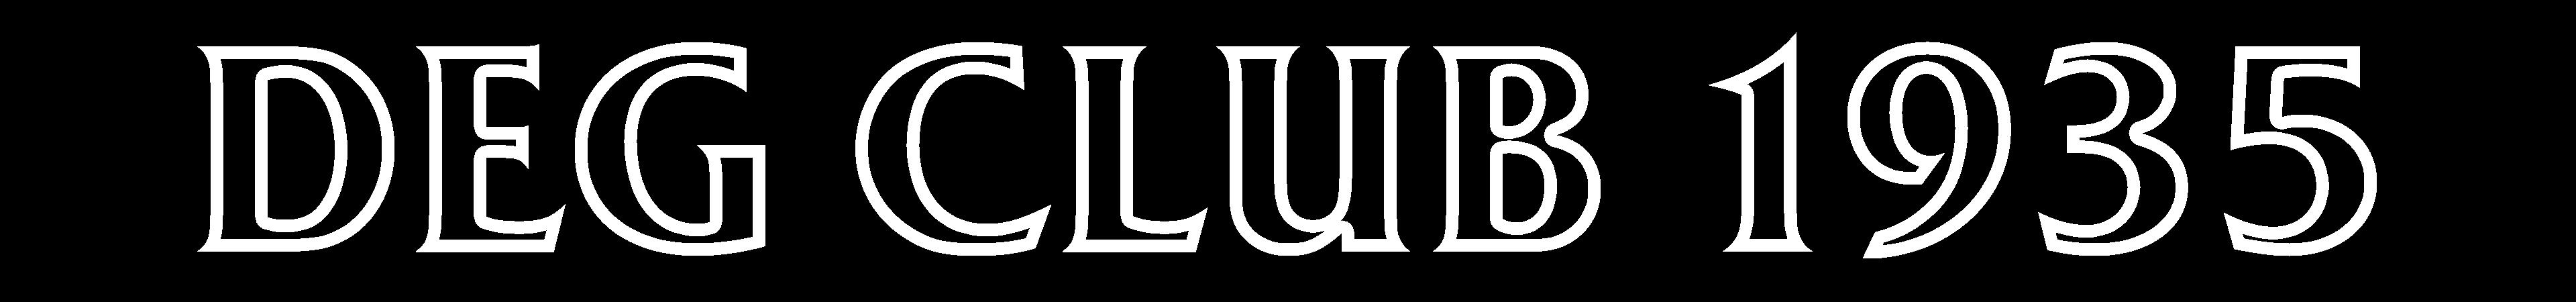 DEG Club 1935